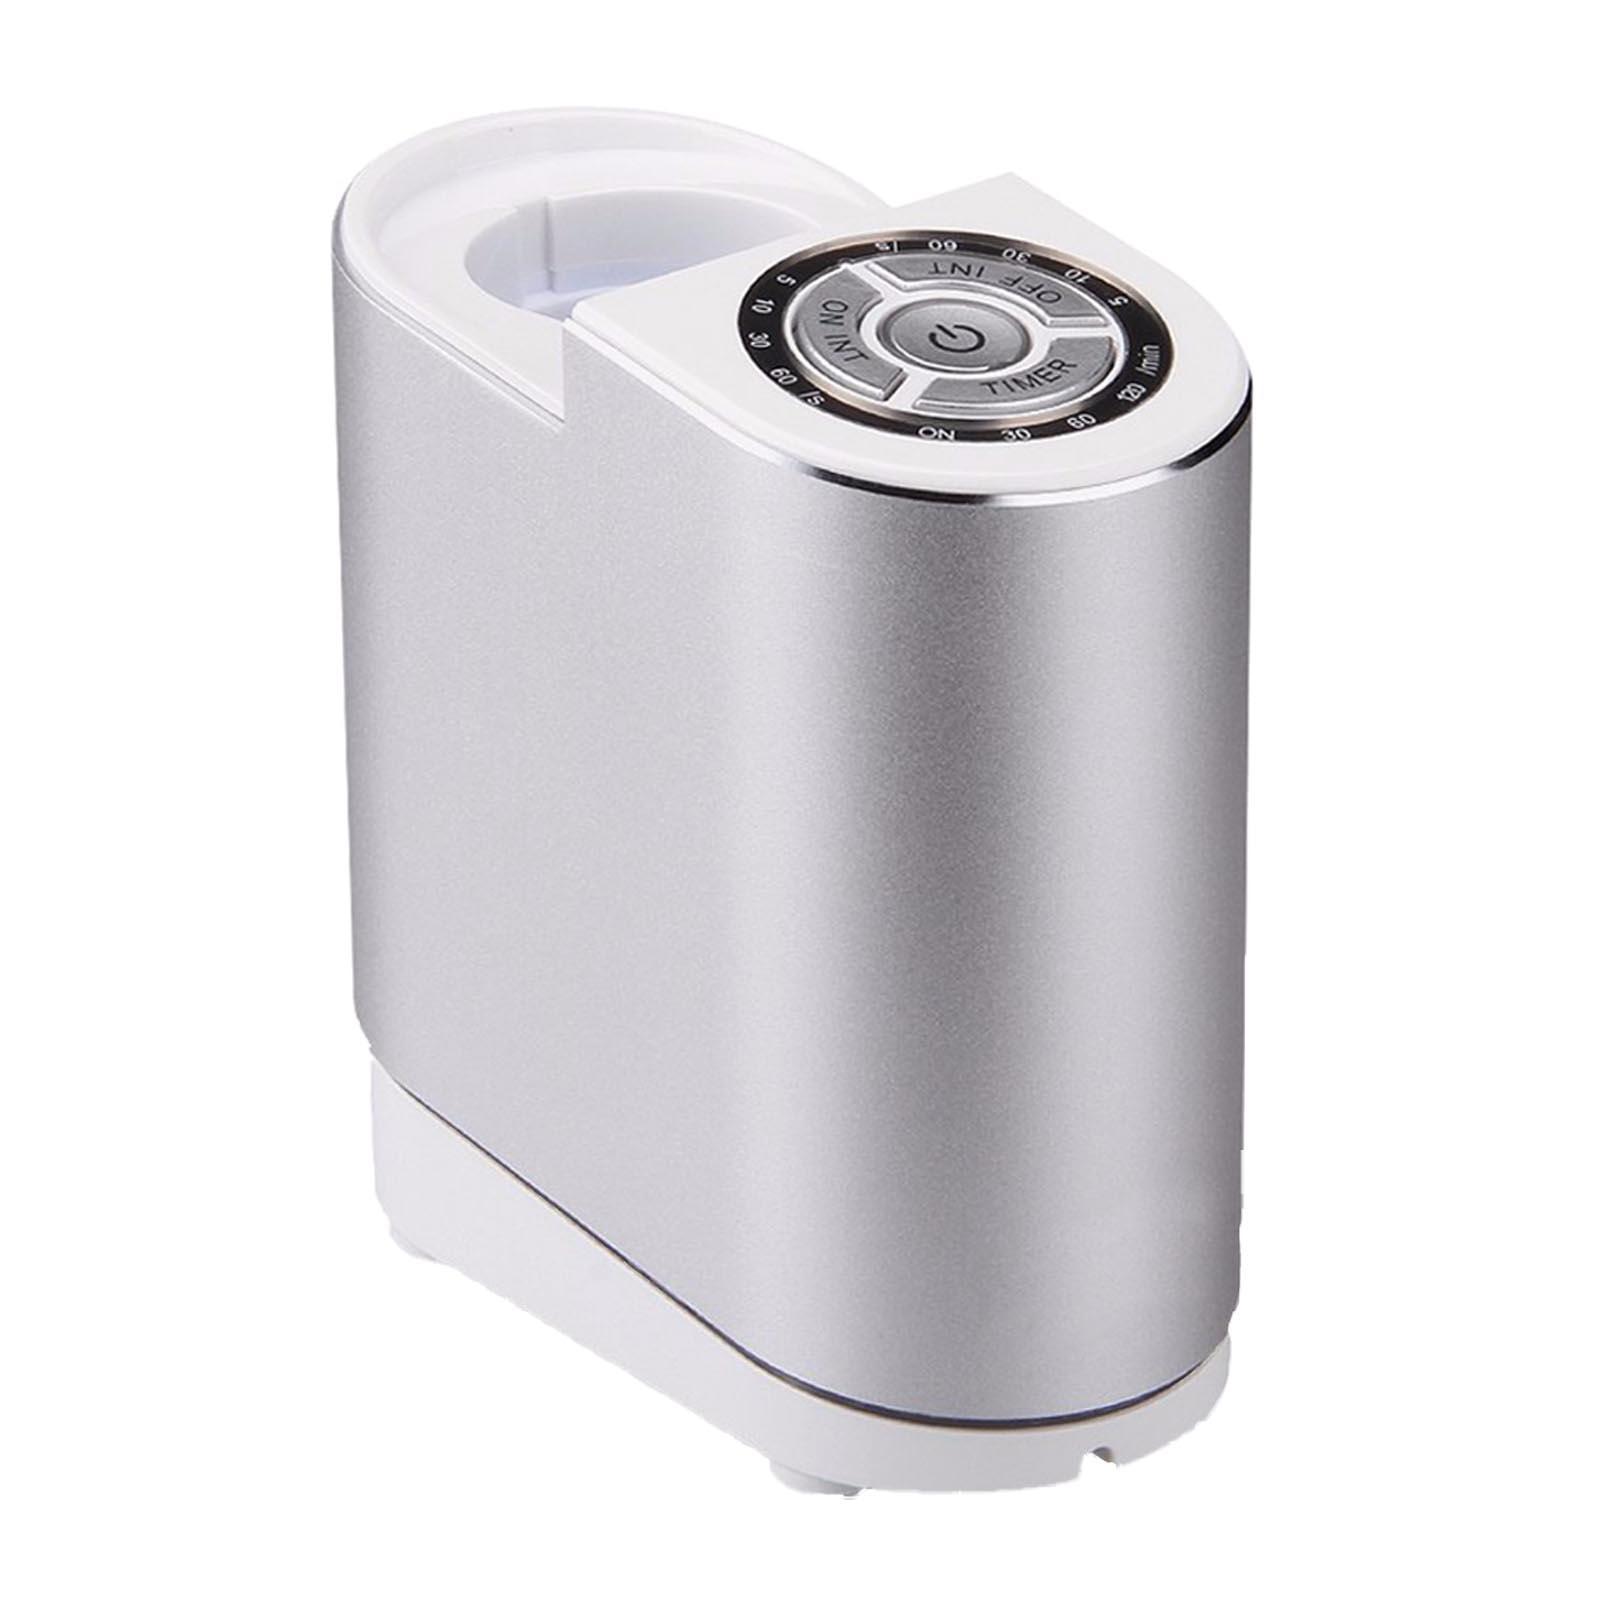 Biofinest N2 Ultrasonic Aroma Nebulizer